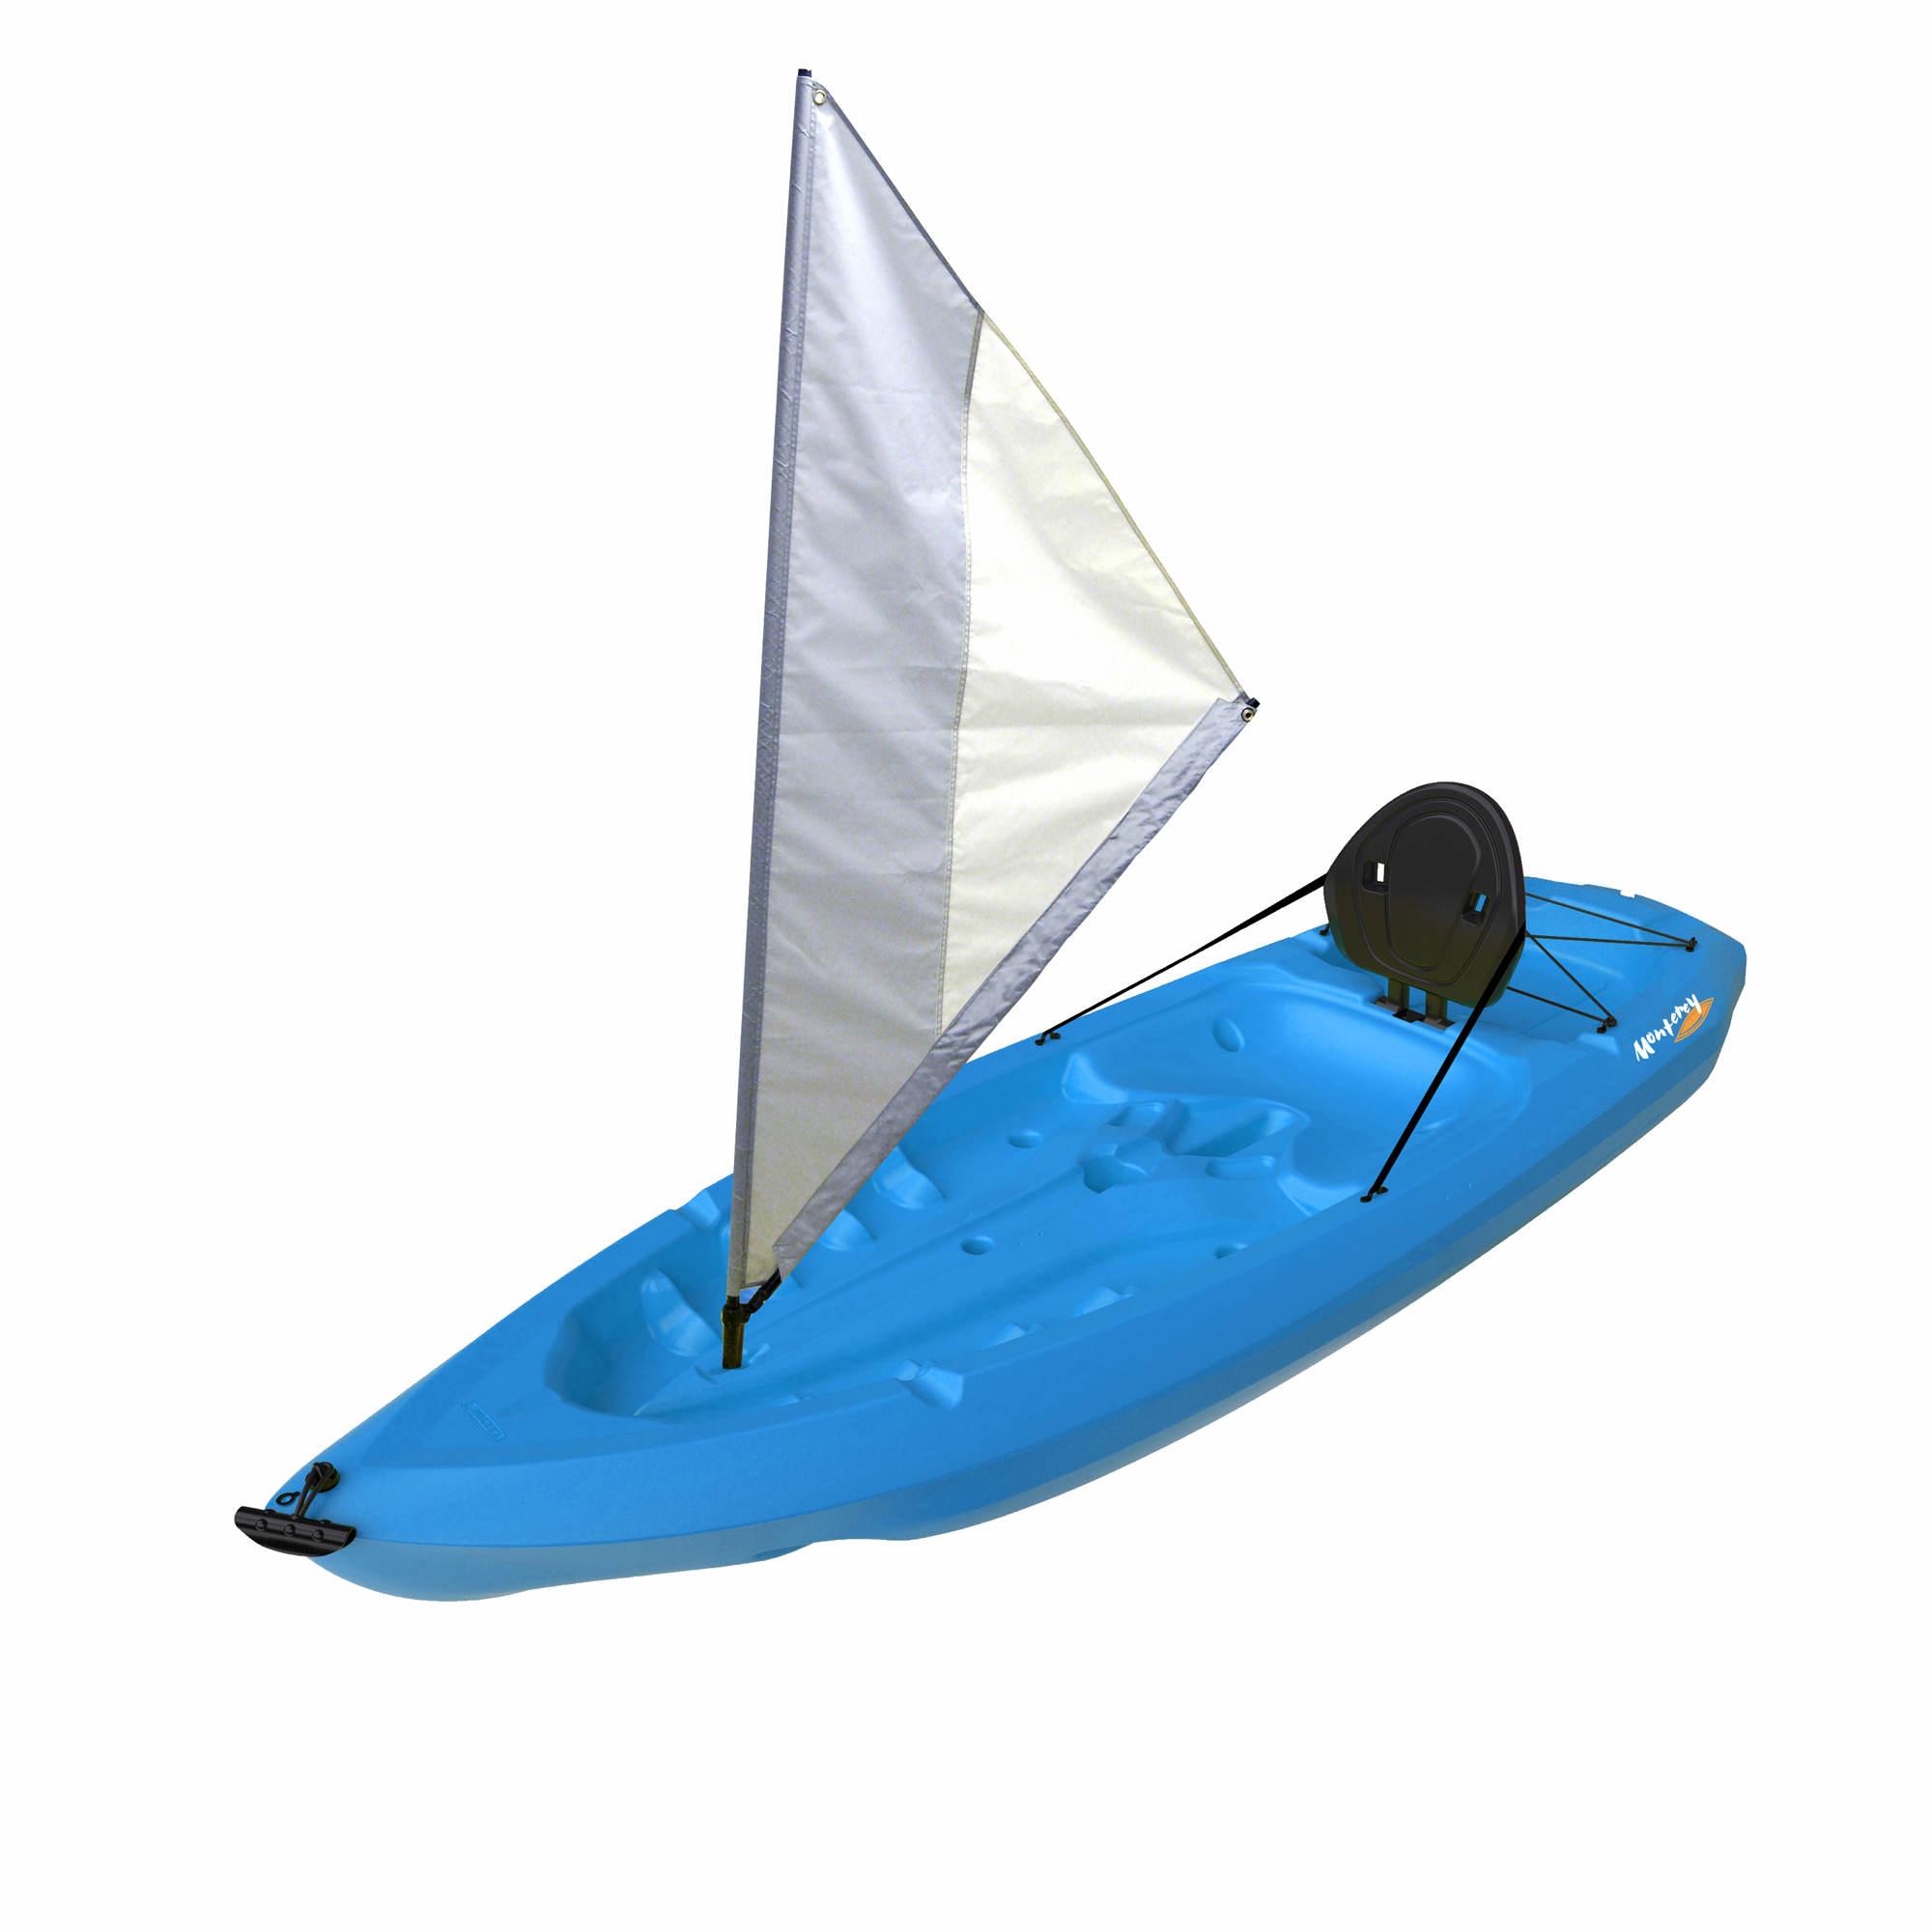 hobie sail kit instructions